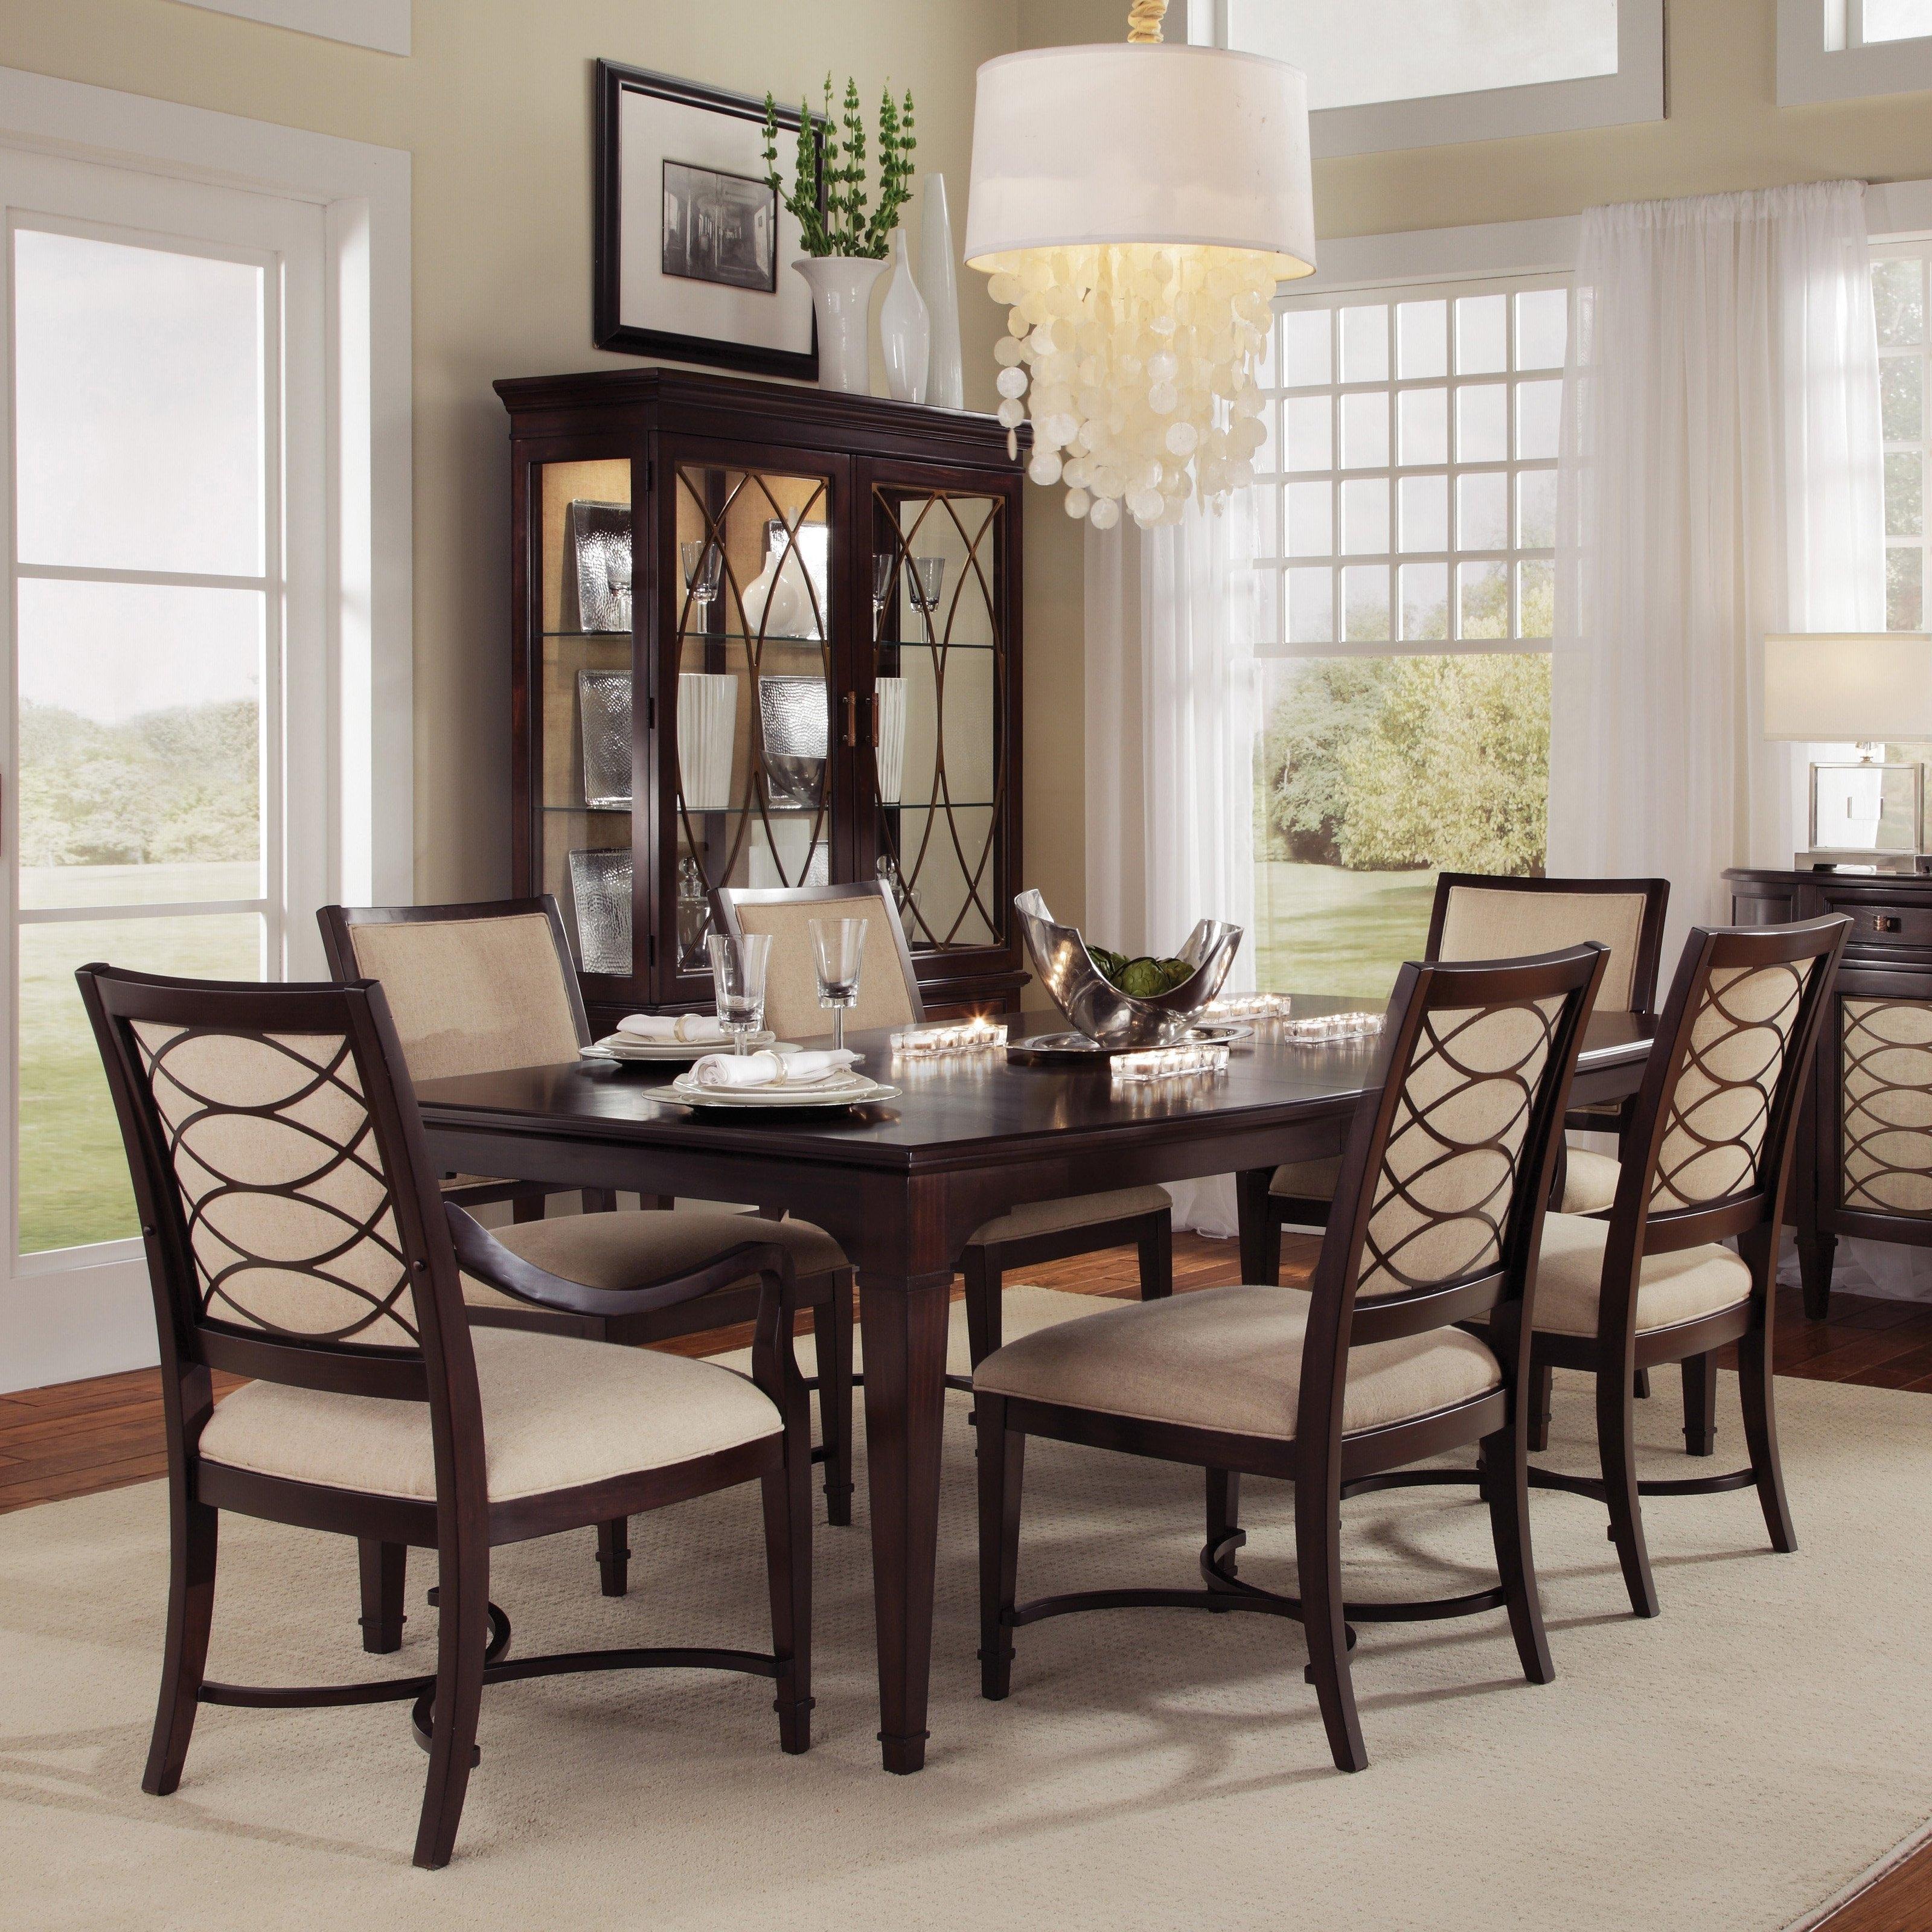 Latest Dark Wood Dining Tables Inside Dark Wood Dining Table And Chairs Hot Pink Dining Chairs (View 17 of 25)